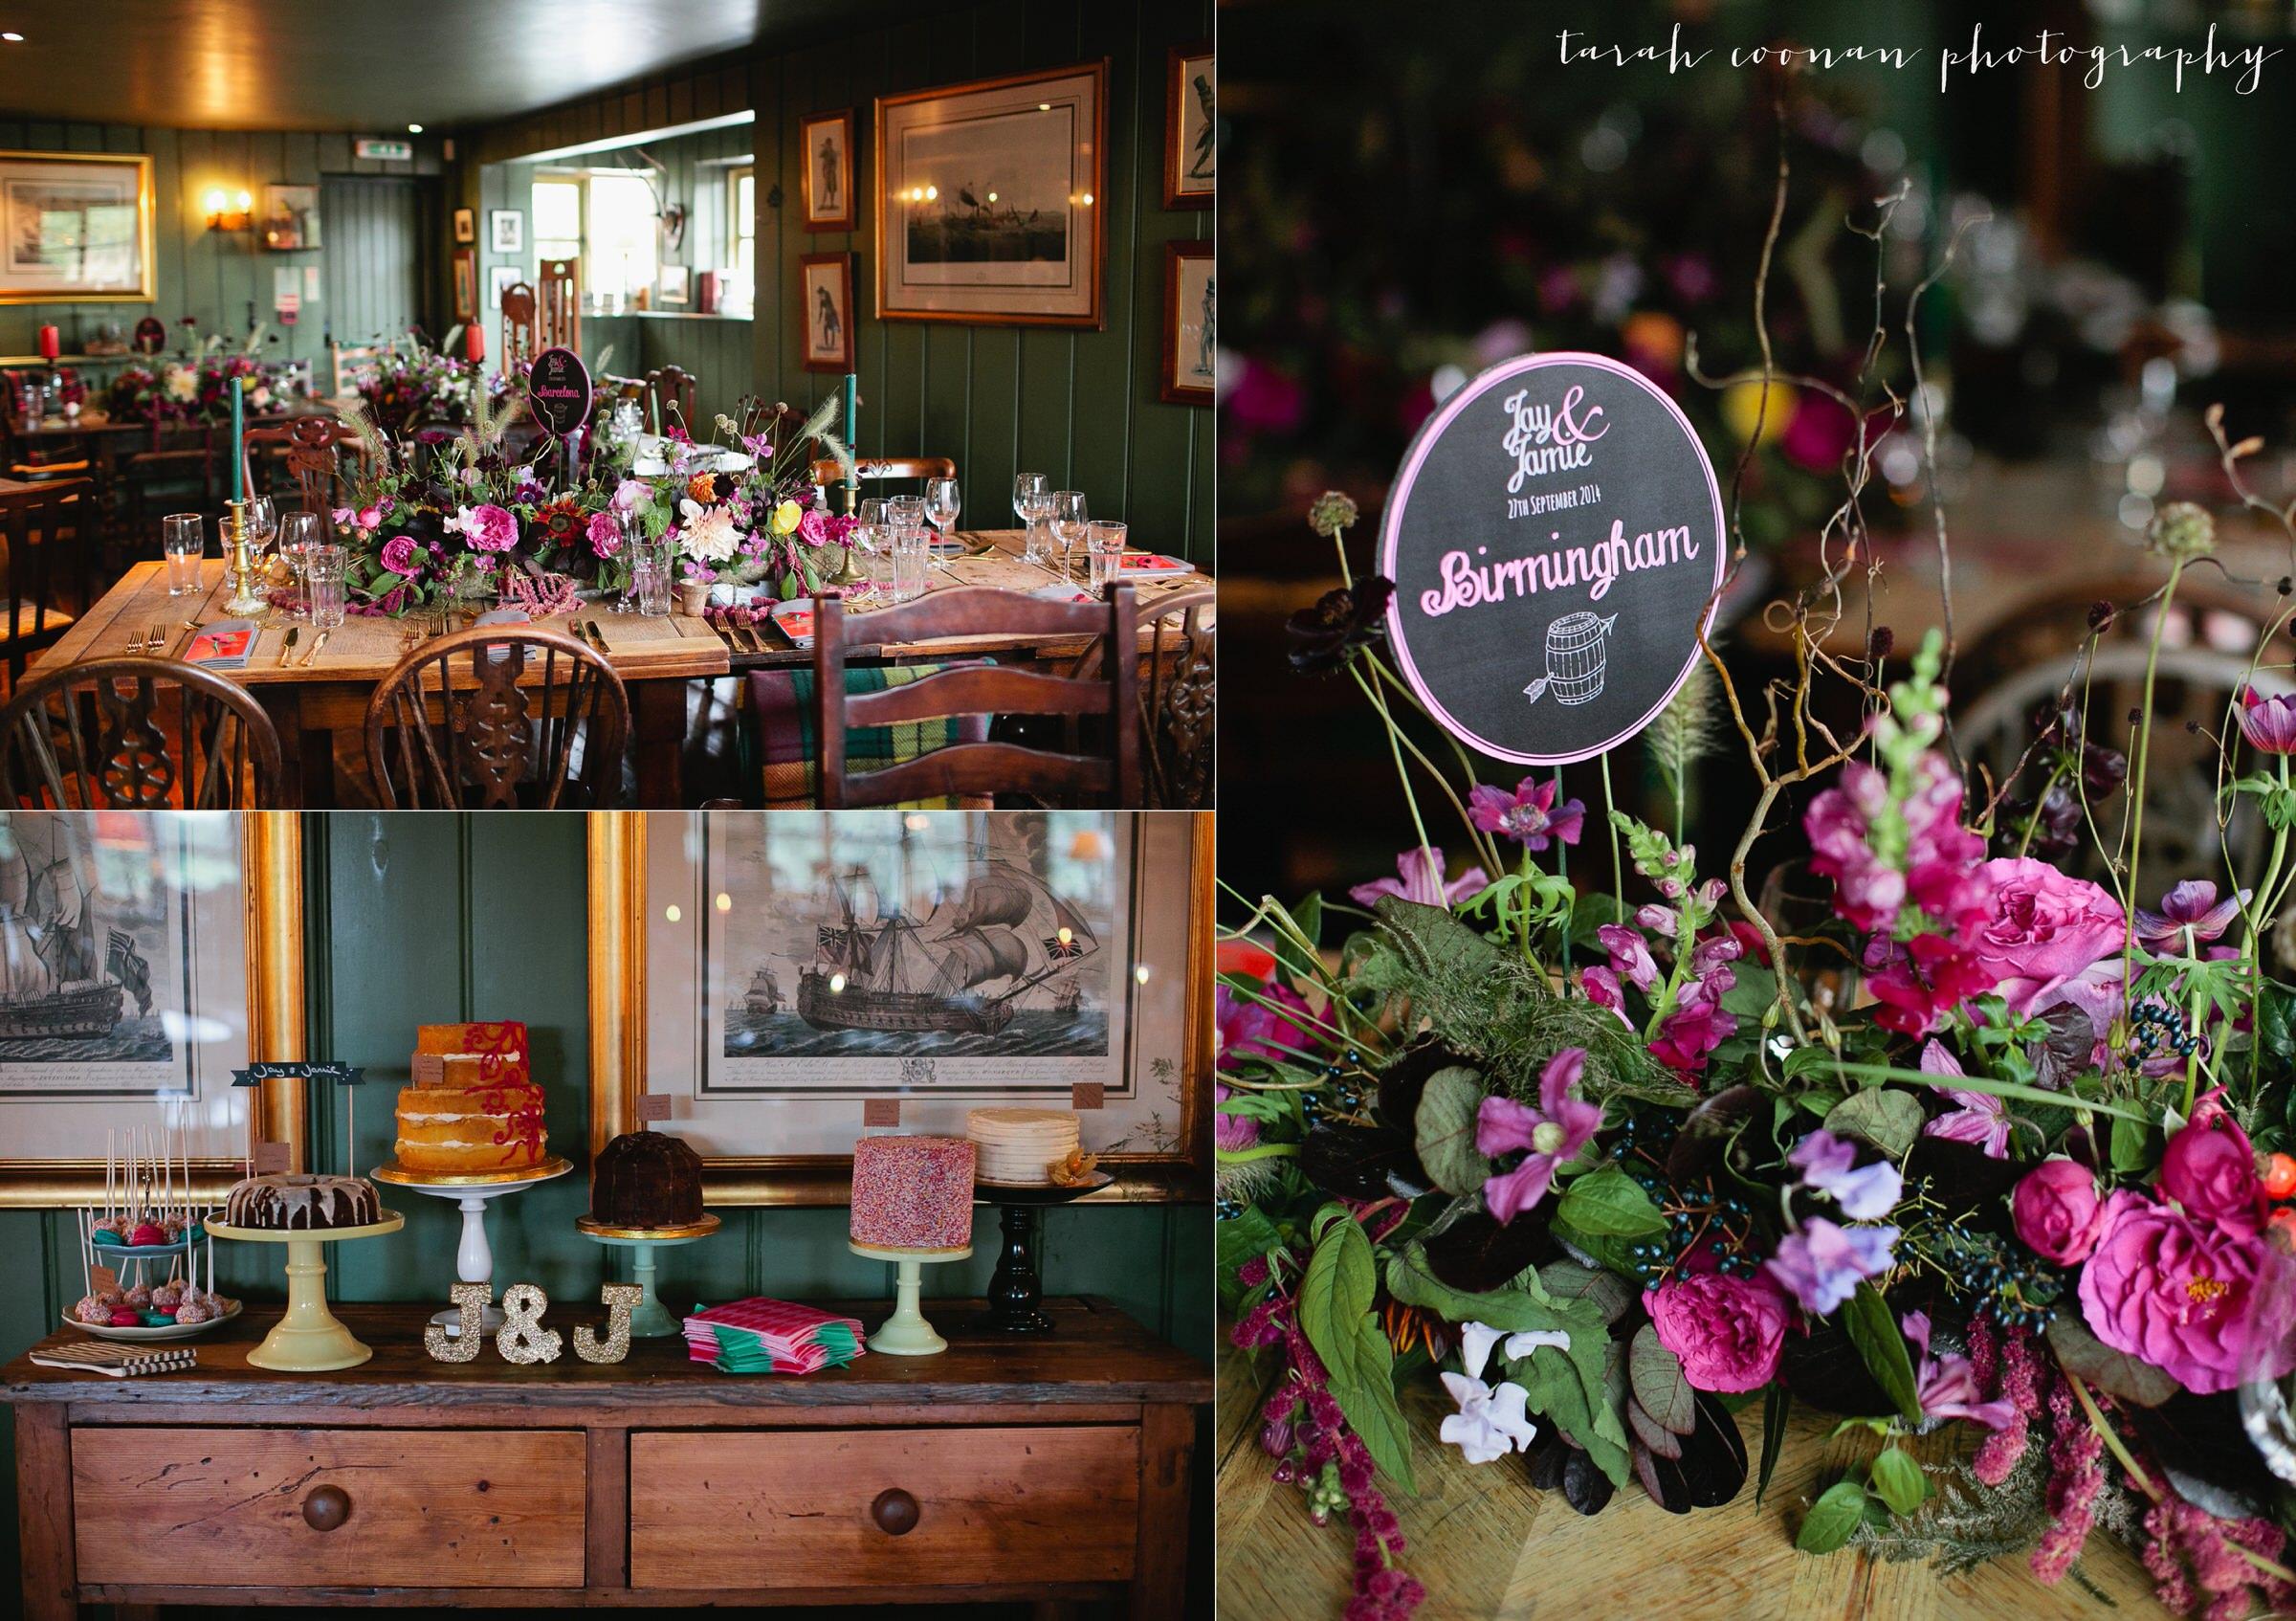 anchor inn lower froyle wedding